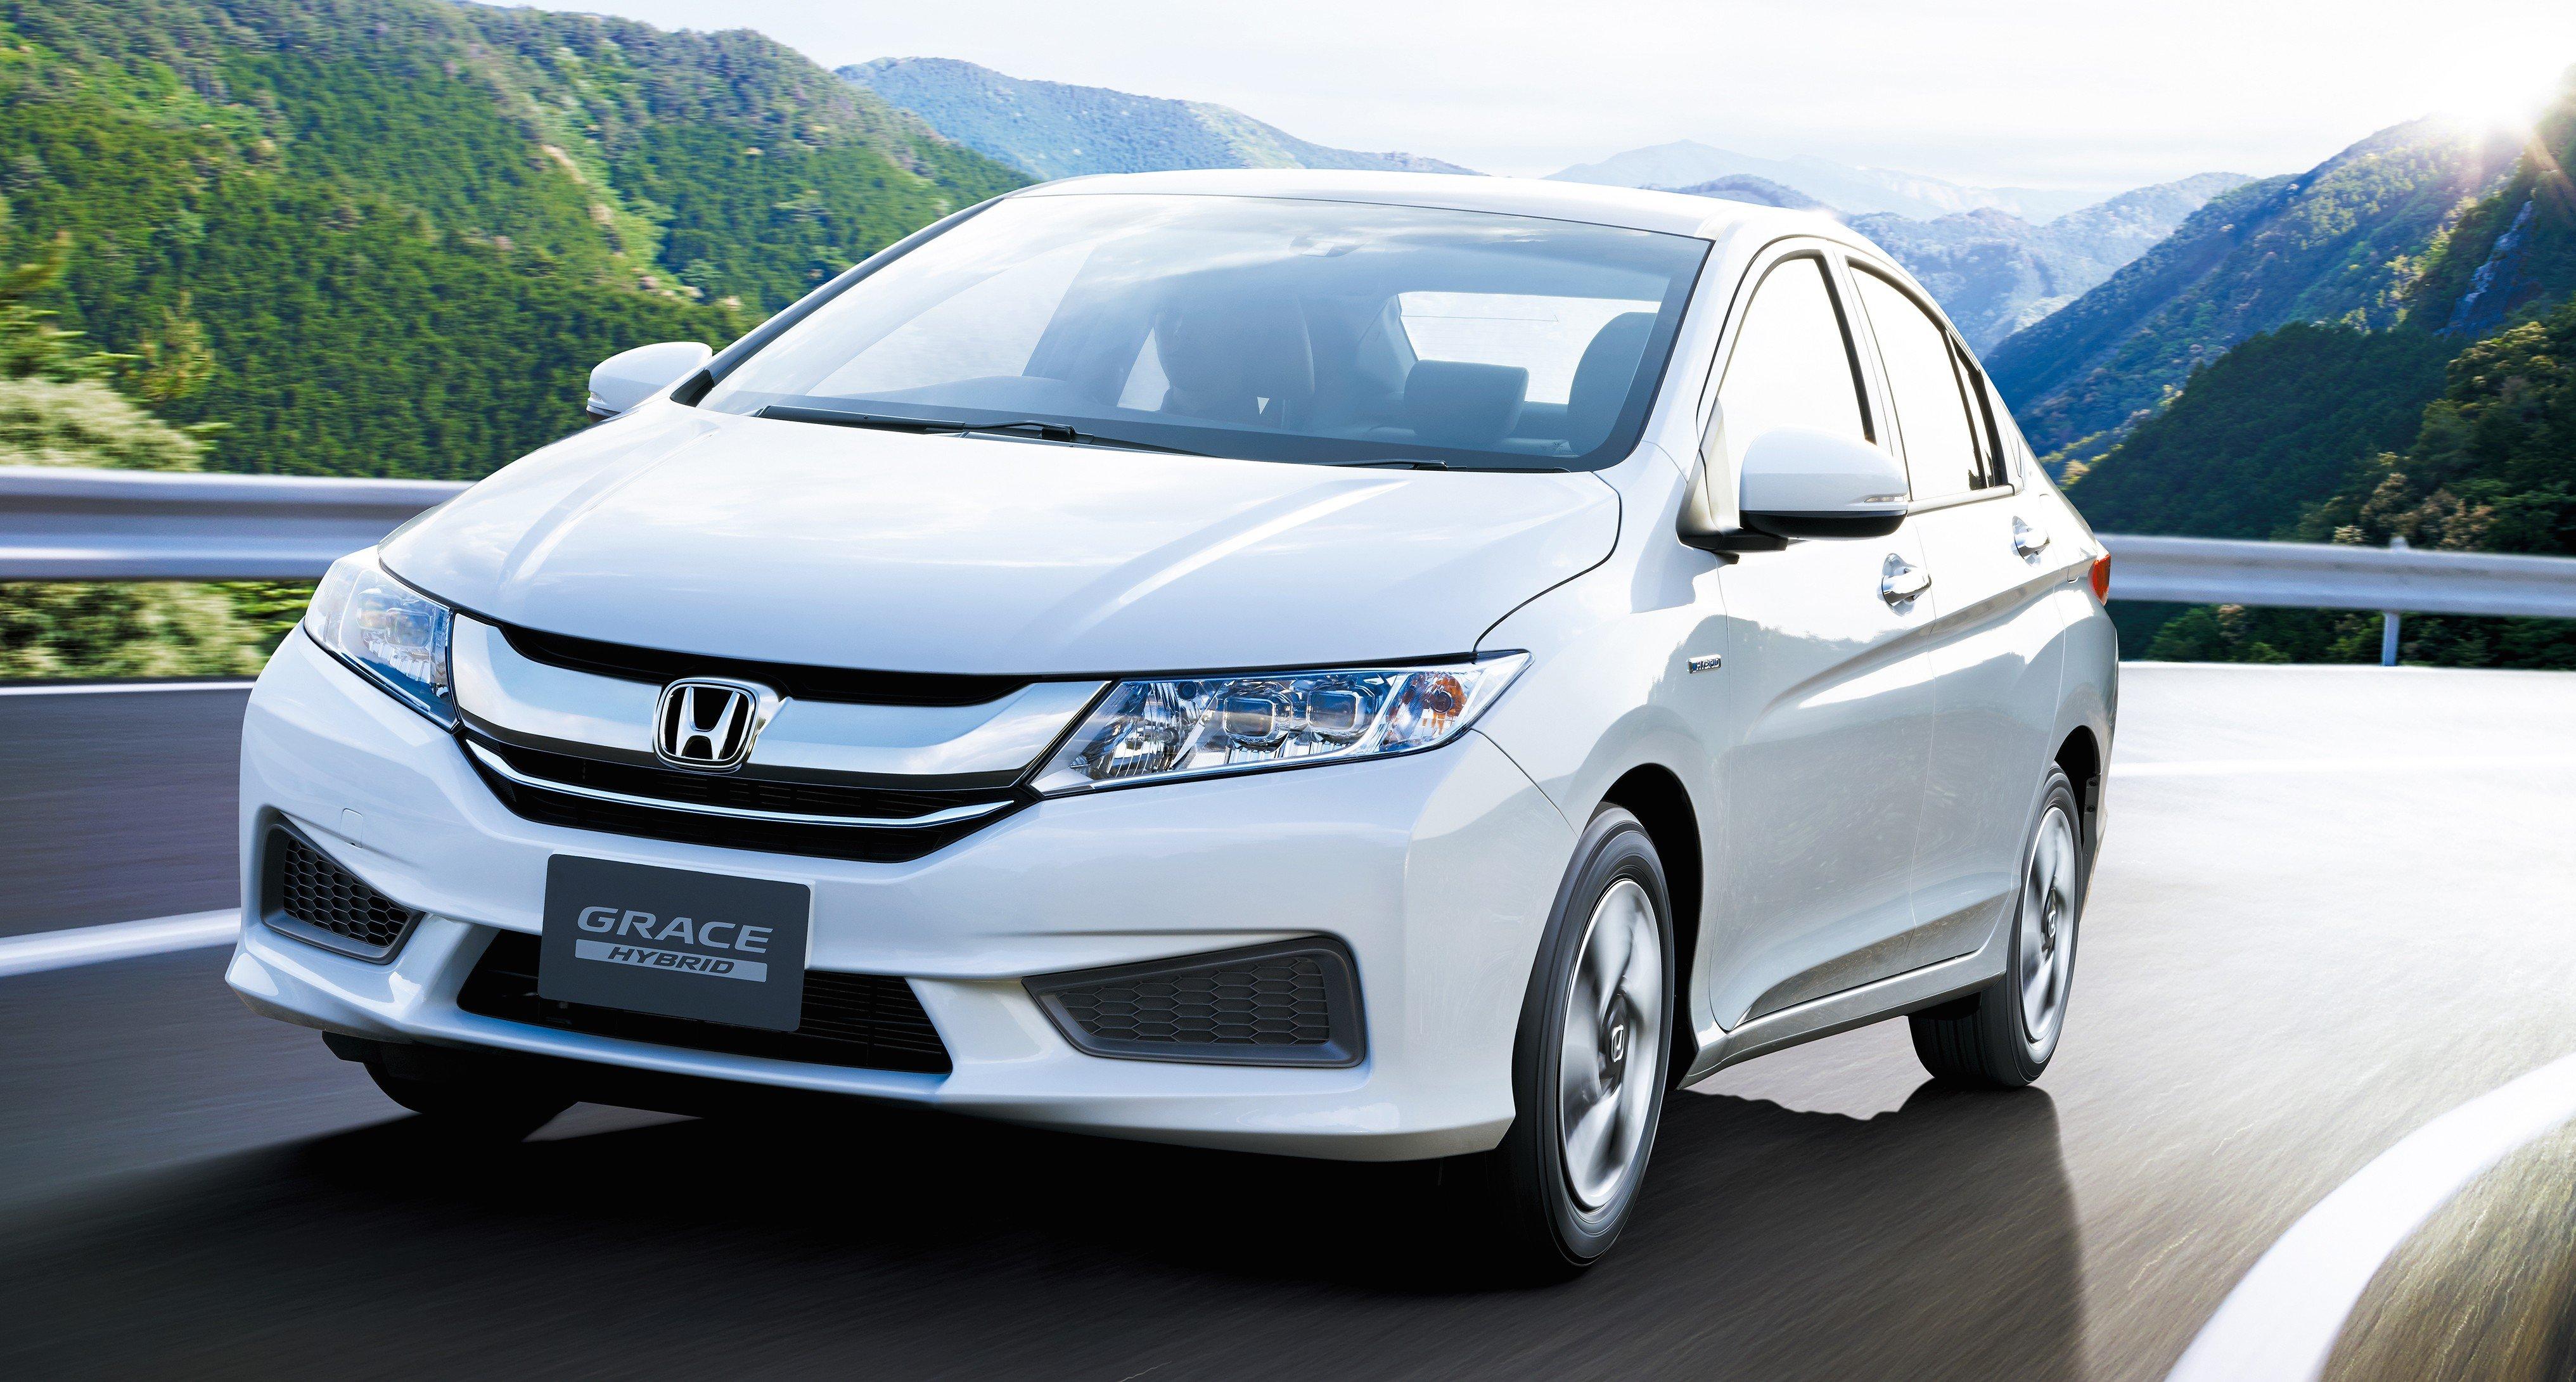 Honda City Hybrid unveiled in Japan as Honda Grace